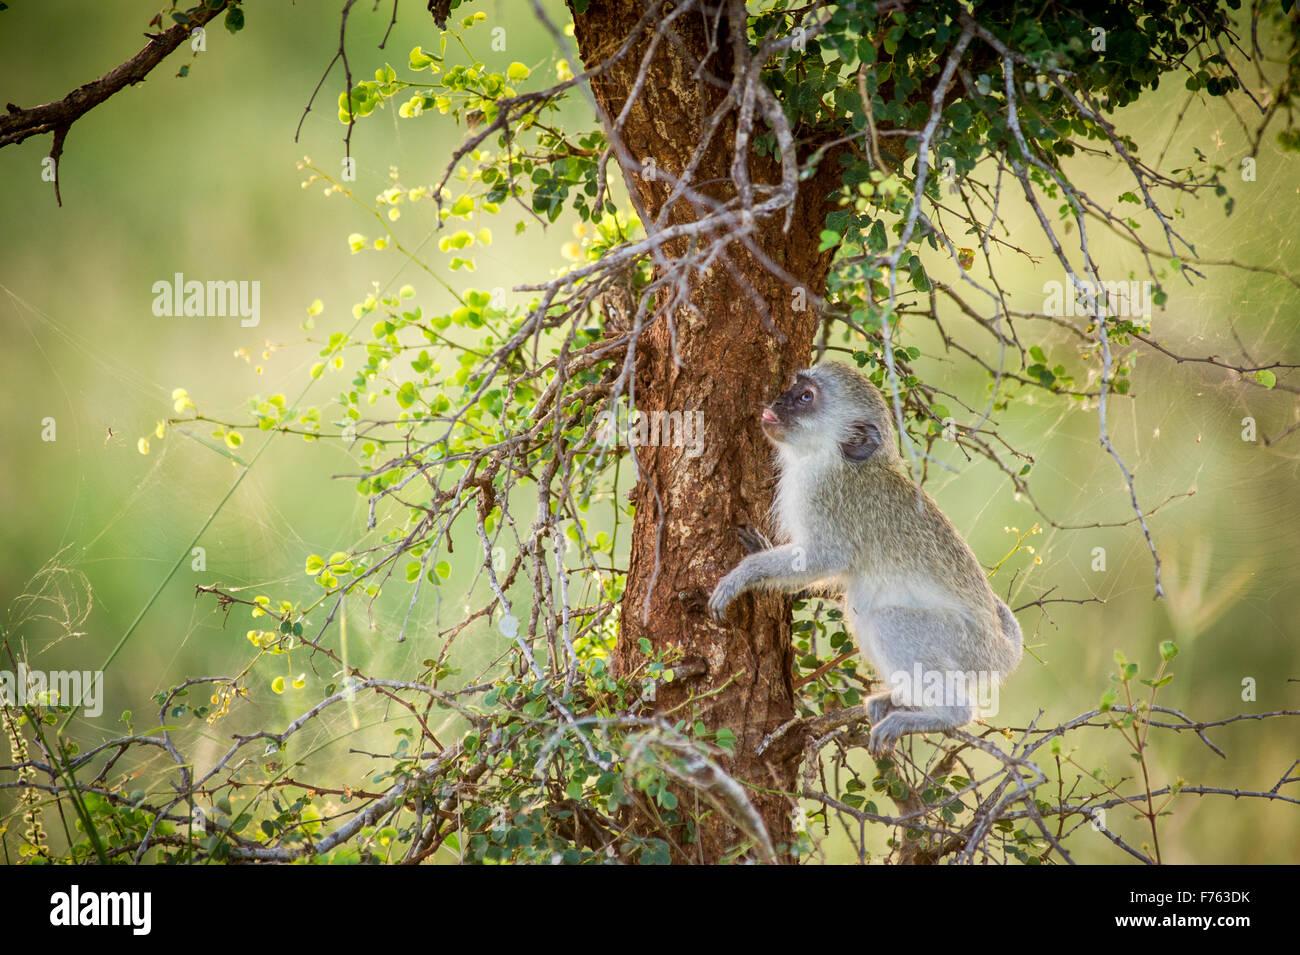 Sudáfrica: Parque Nacional Kruger Vervet Monkey (Chlorocebus pygerythrus) Imagen De Stock